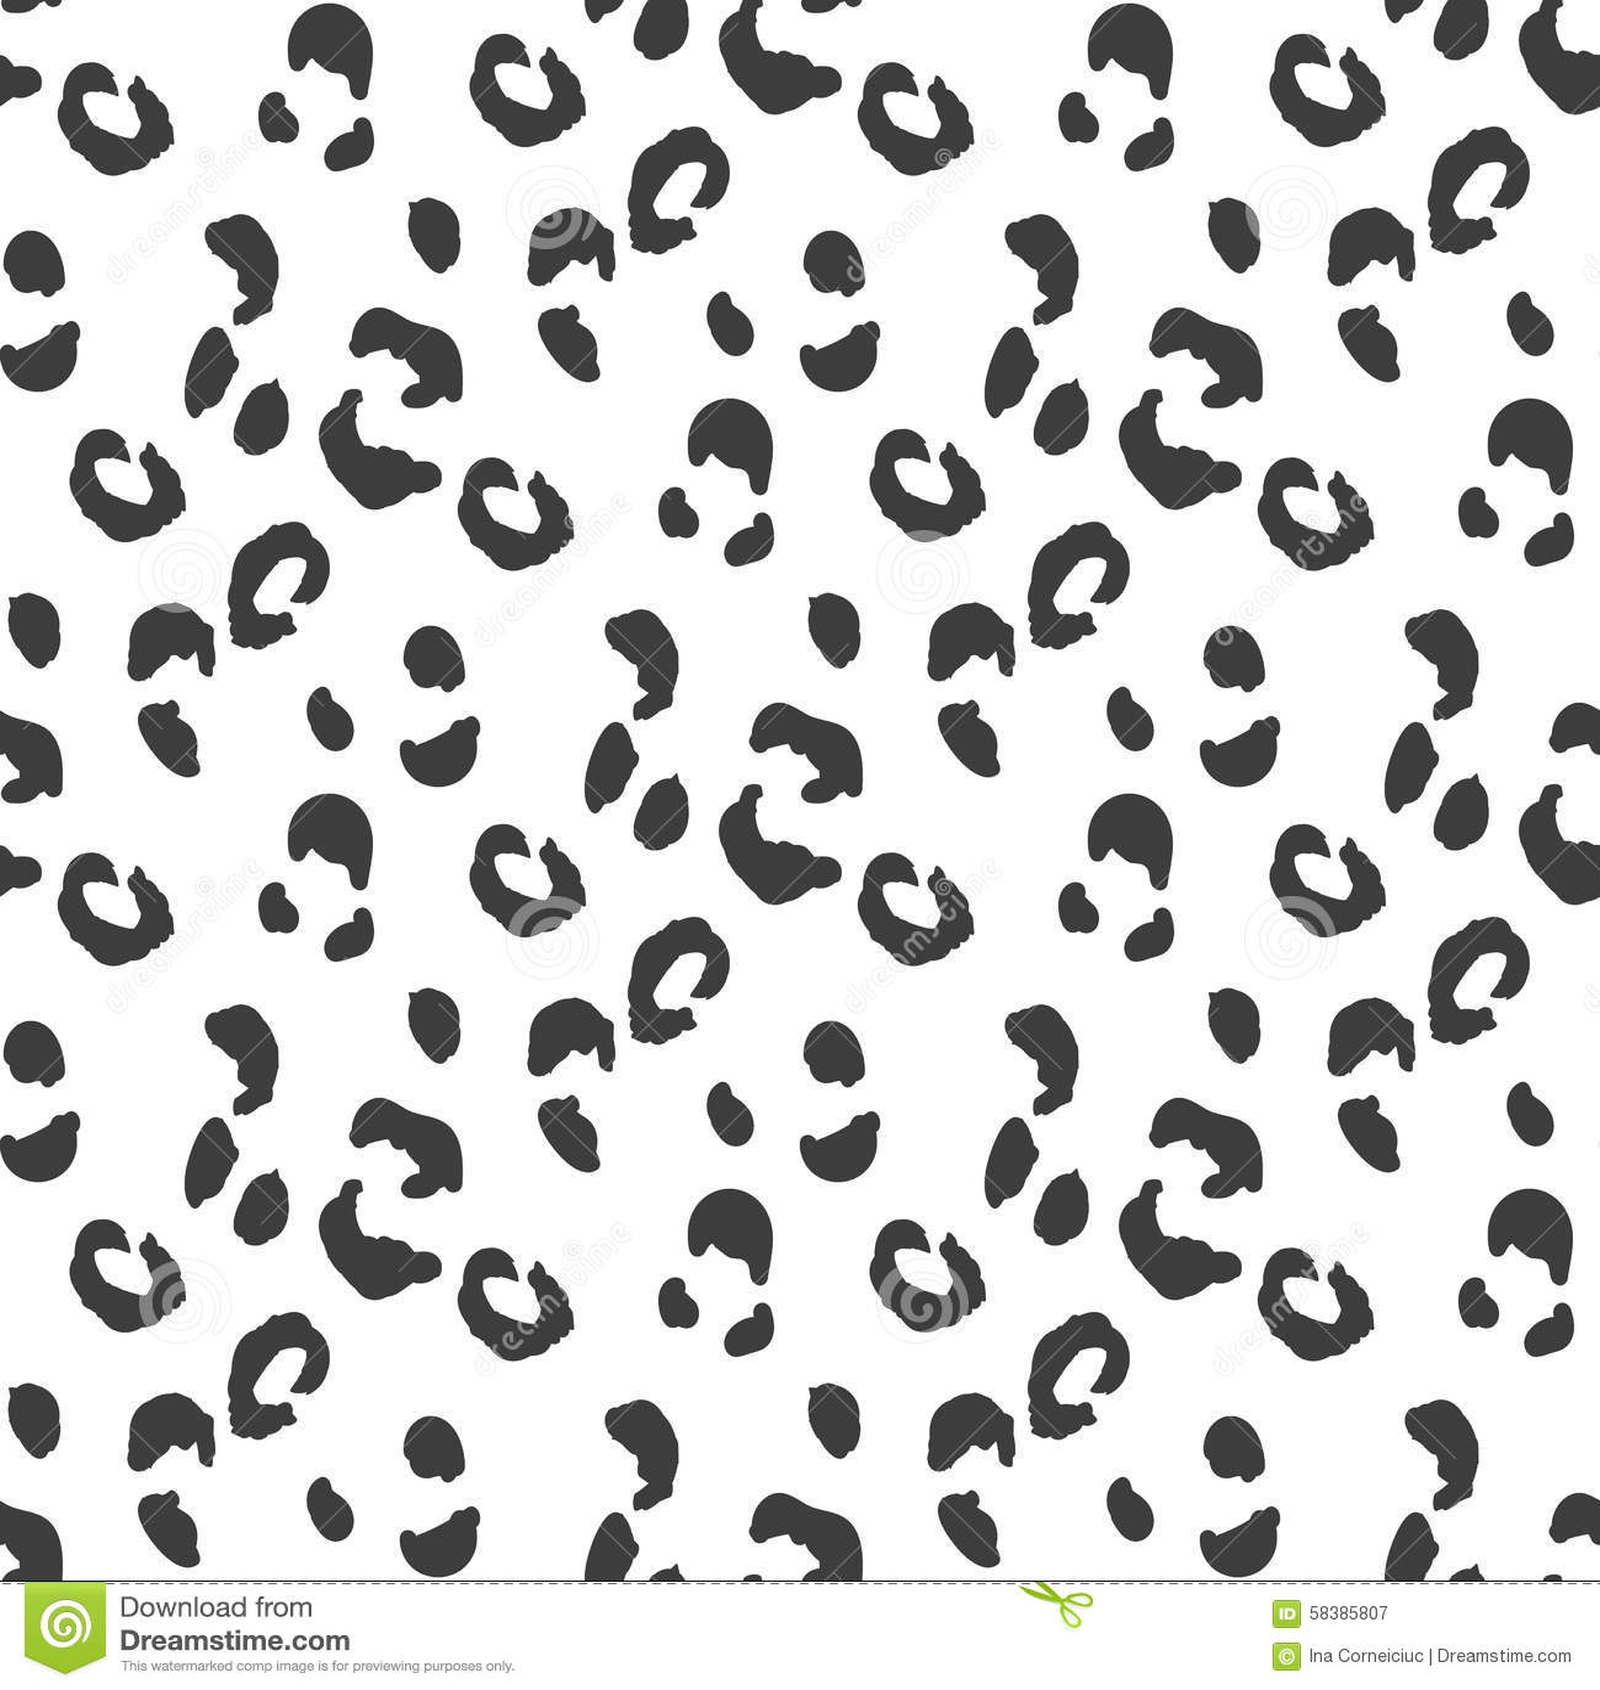 Leopard Skin Seamless Pattern Monochrome Wild Cat